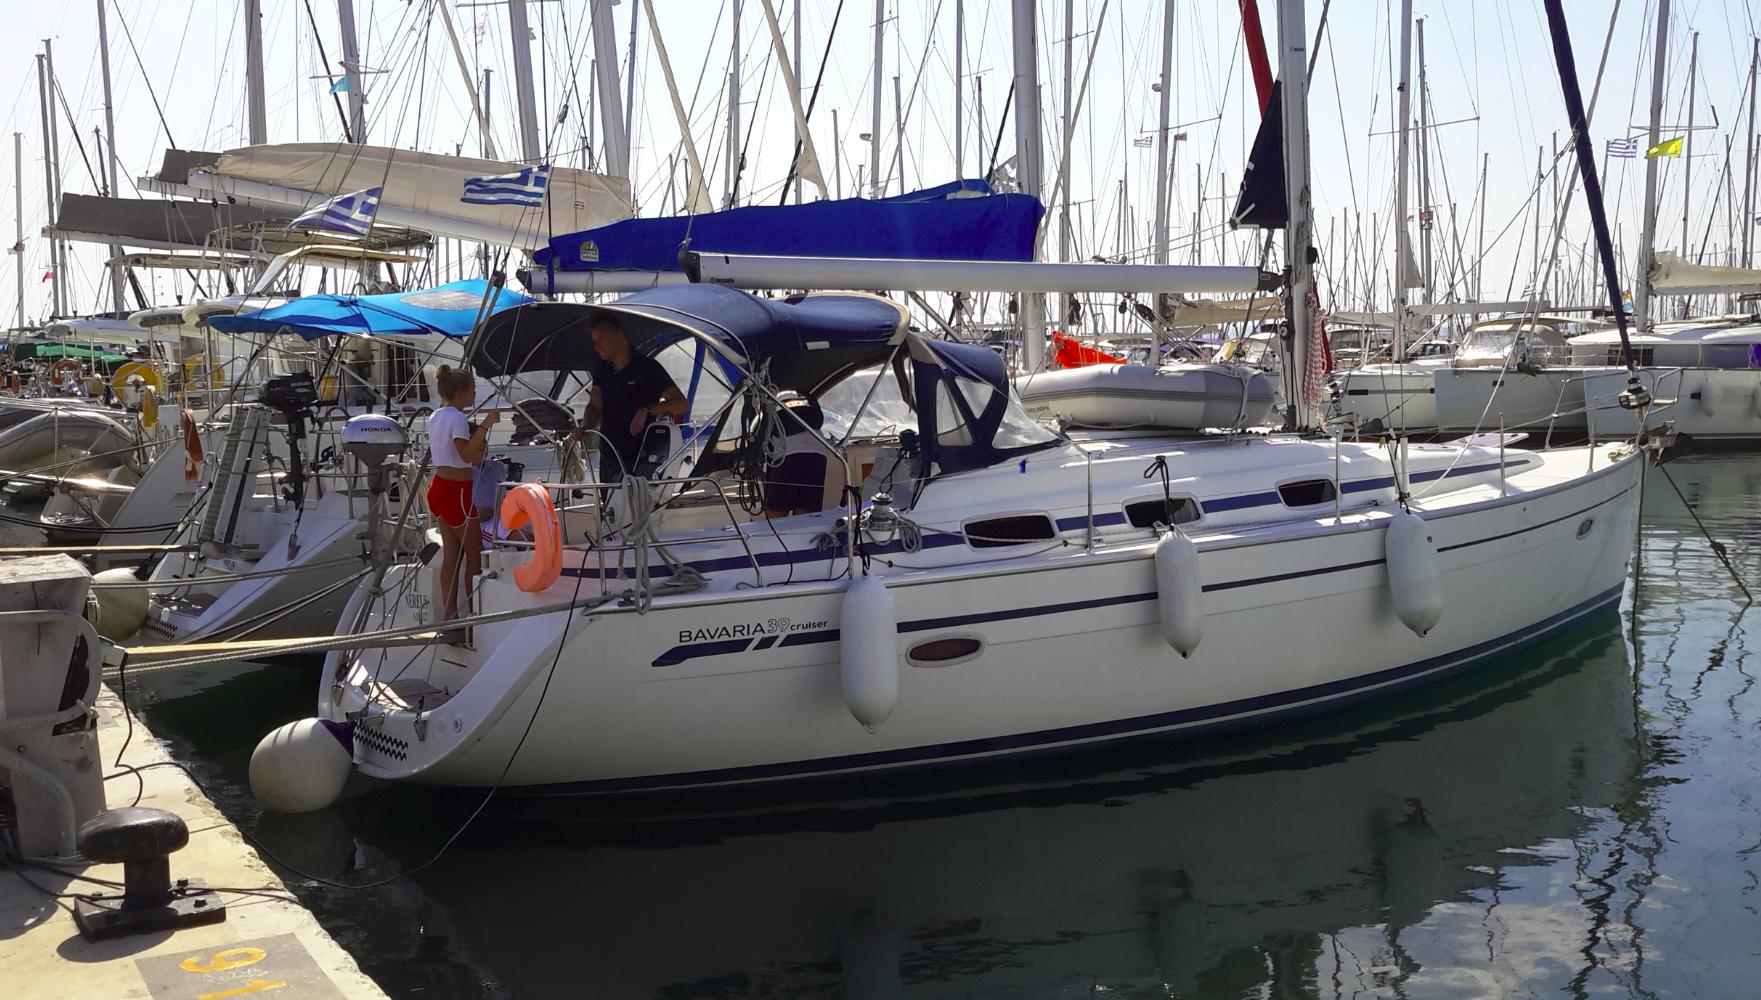 Bavaria 39 Cruiser (Nireus)  - 0